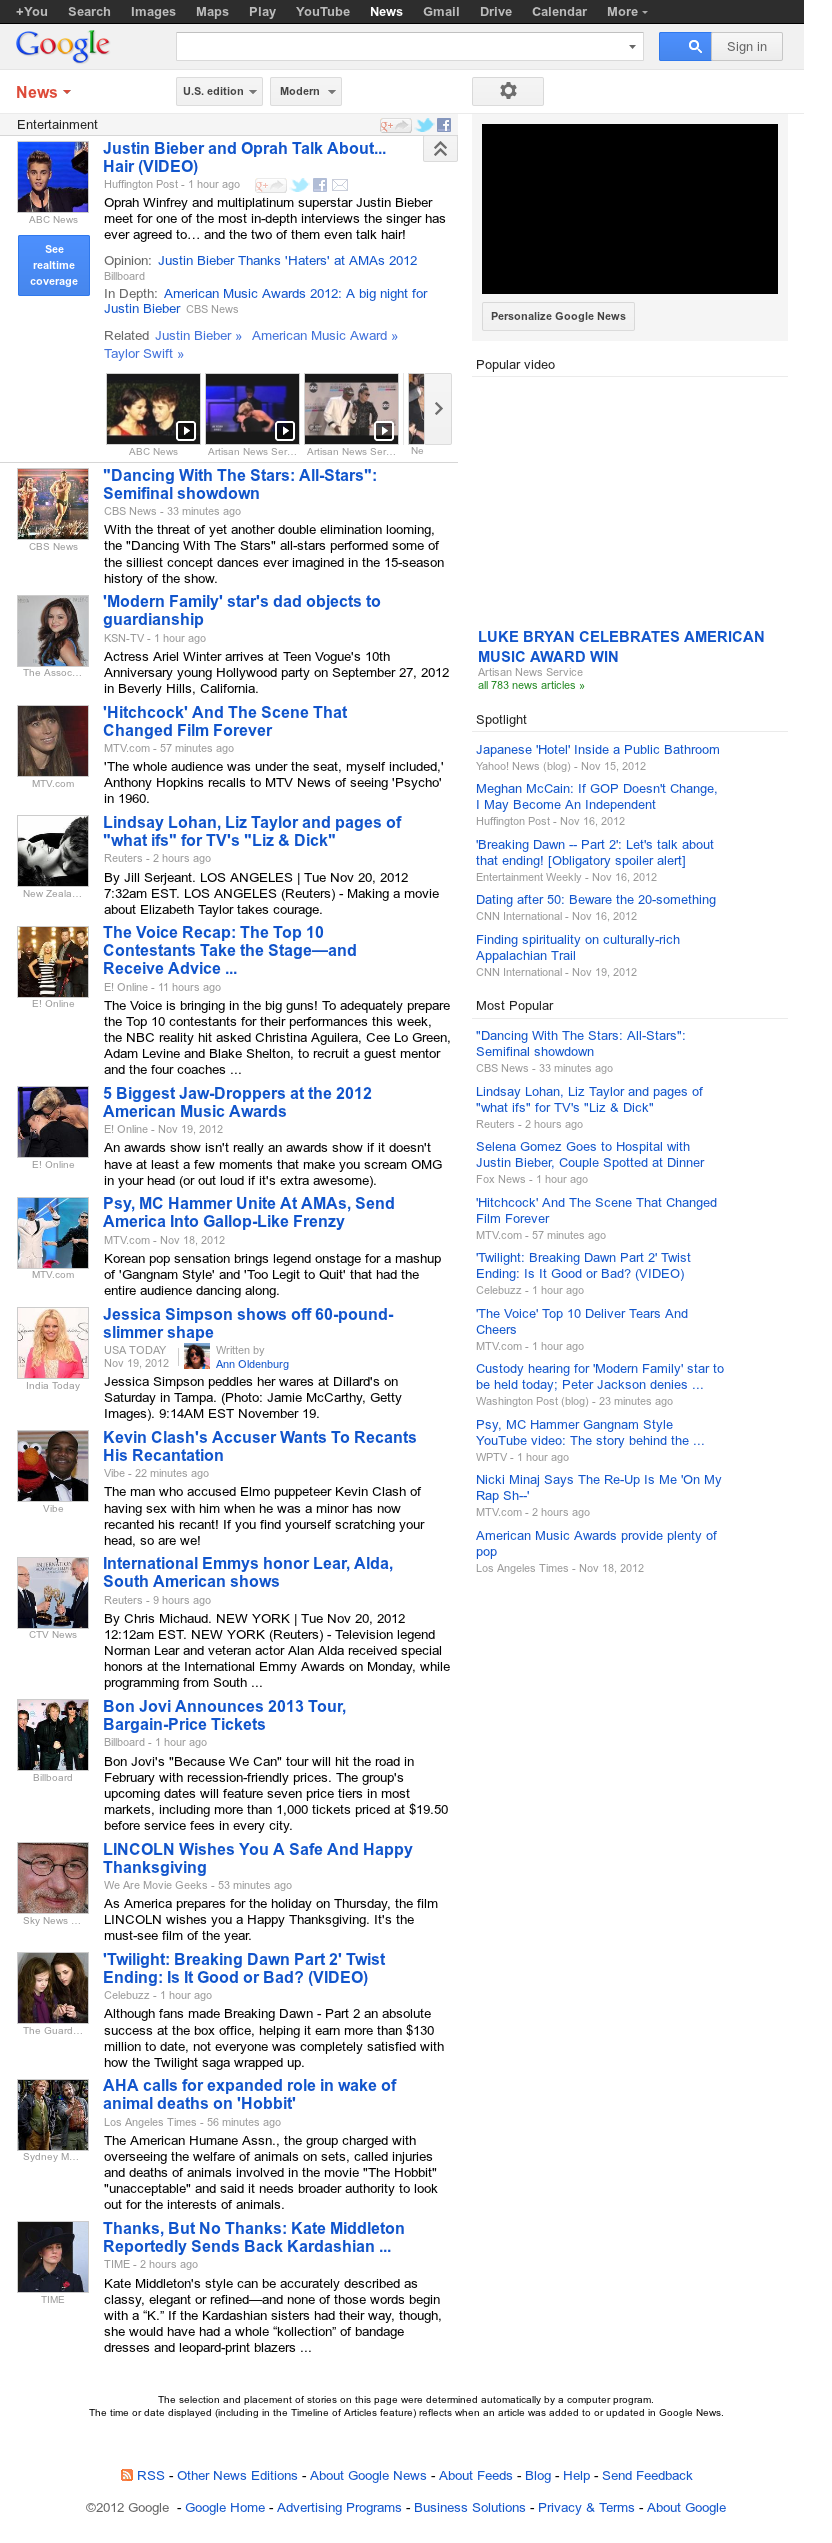 Google News: Entertainment at Tuesday Nov. 20, 2012, 3:10 p.m. UTC